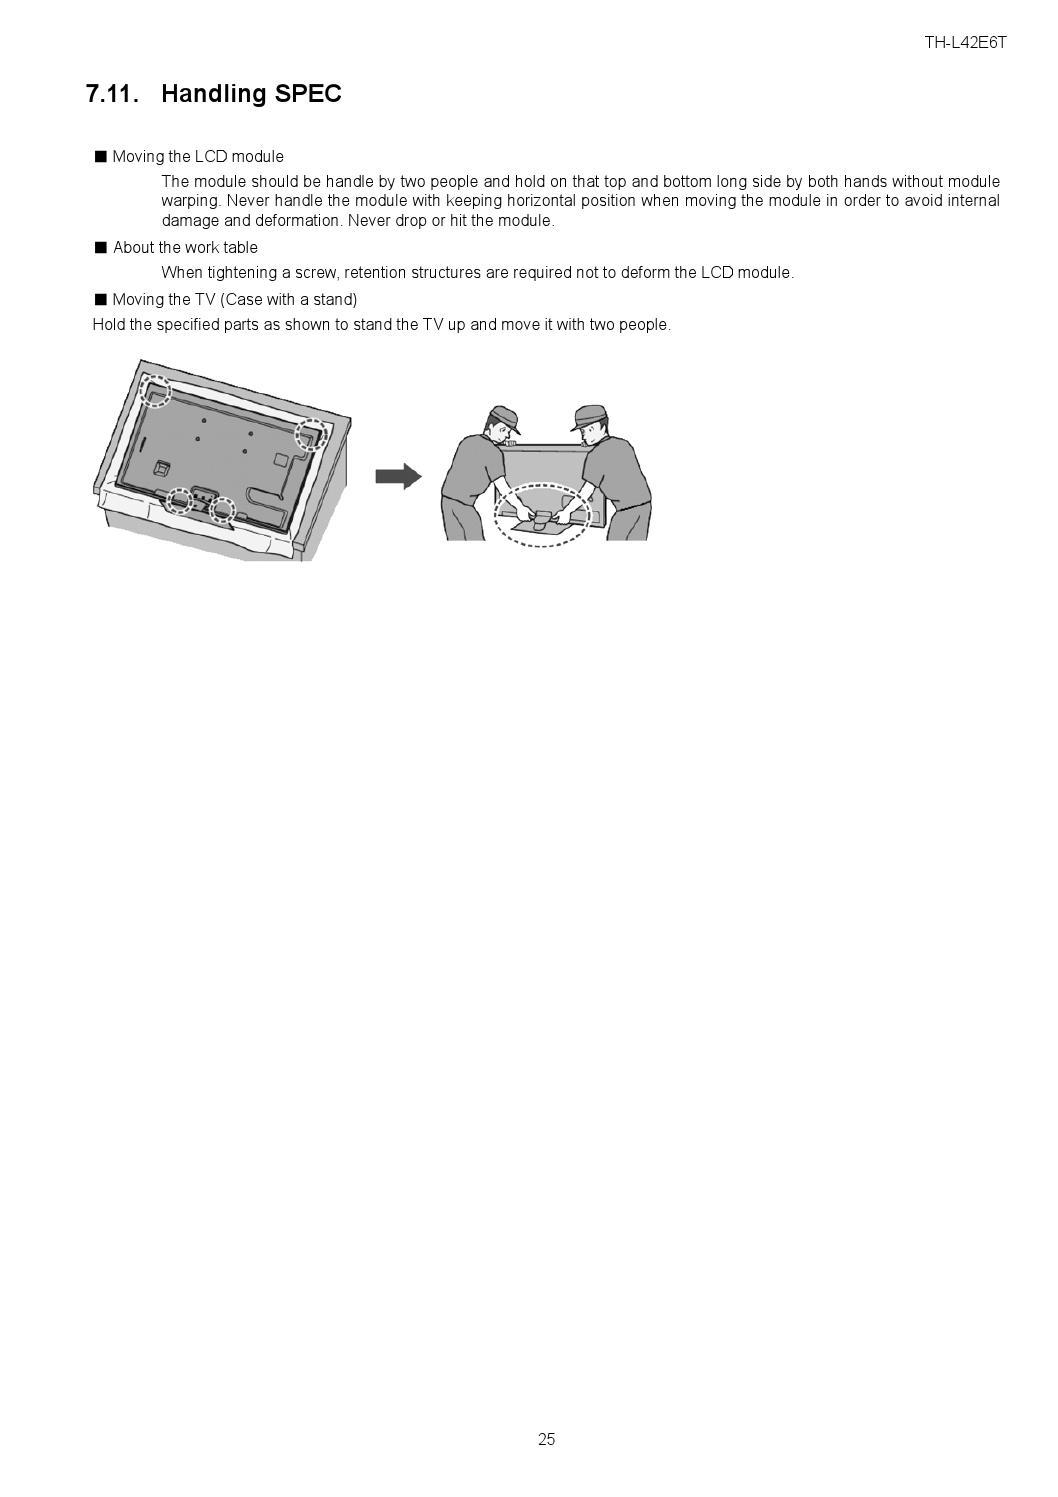 Manual de serviço TV LED PANASONIC TH-L42E6 by Portal da Eletrônica